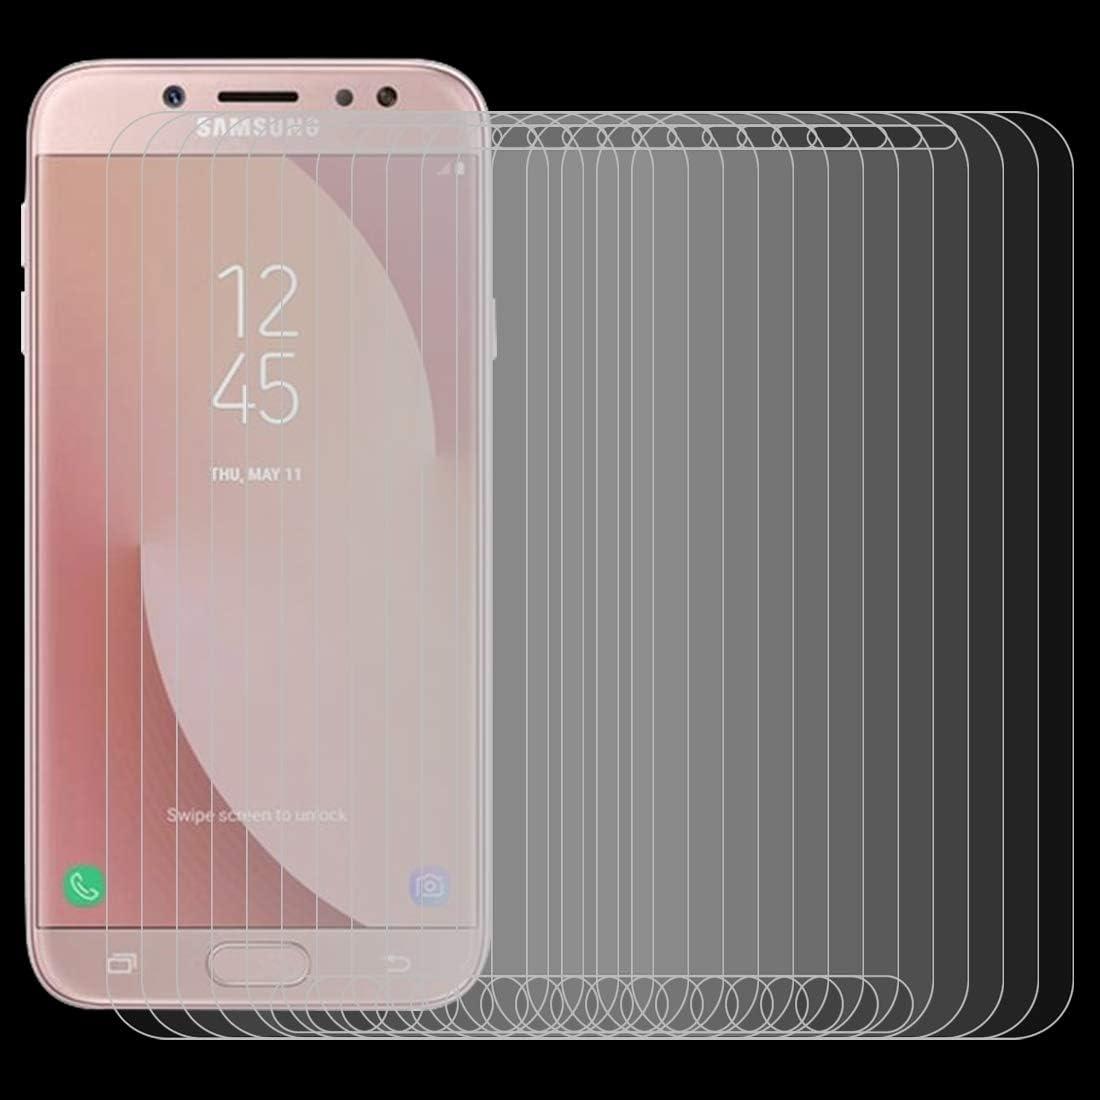 J730 Screen Protectors for Phone Pokjsofjnjlfkl Phone Accessories 100 PCS 0.26mm 9H 2.5D Arc Edge Tempered Glass Film for Galaxy J7 Pro